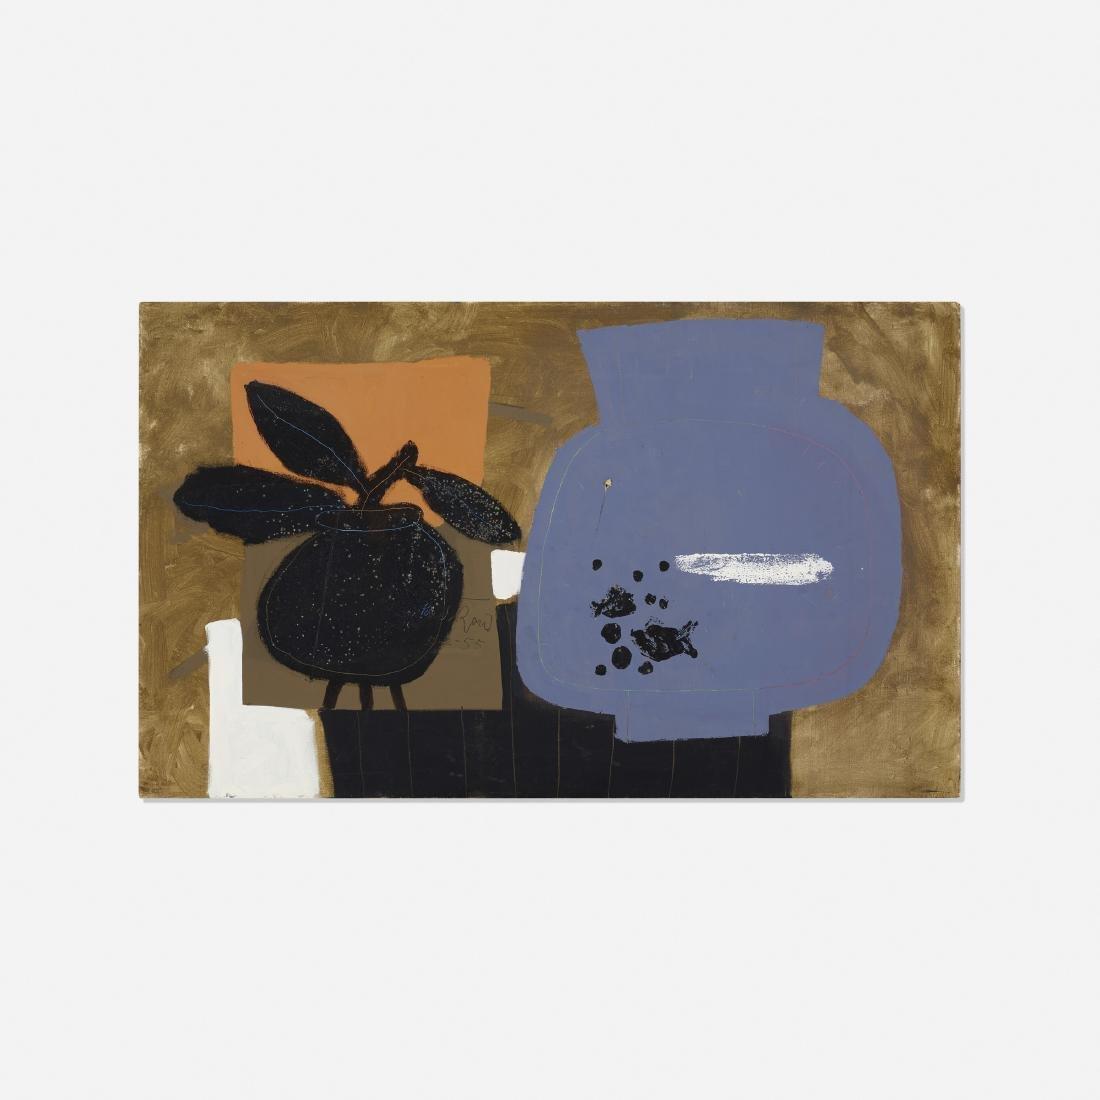 Paul Rand, Untitled